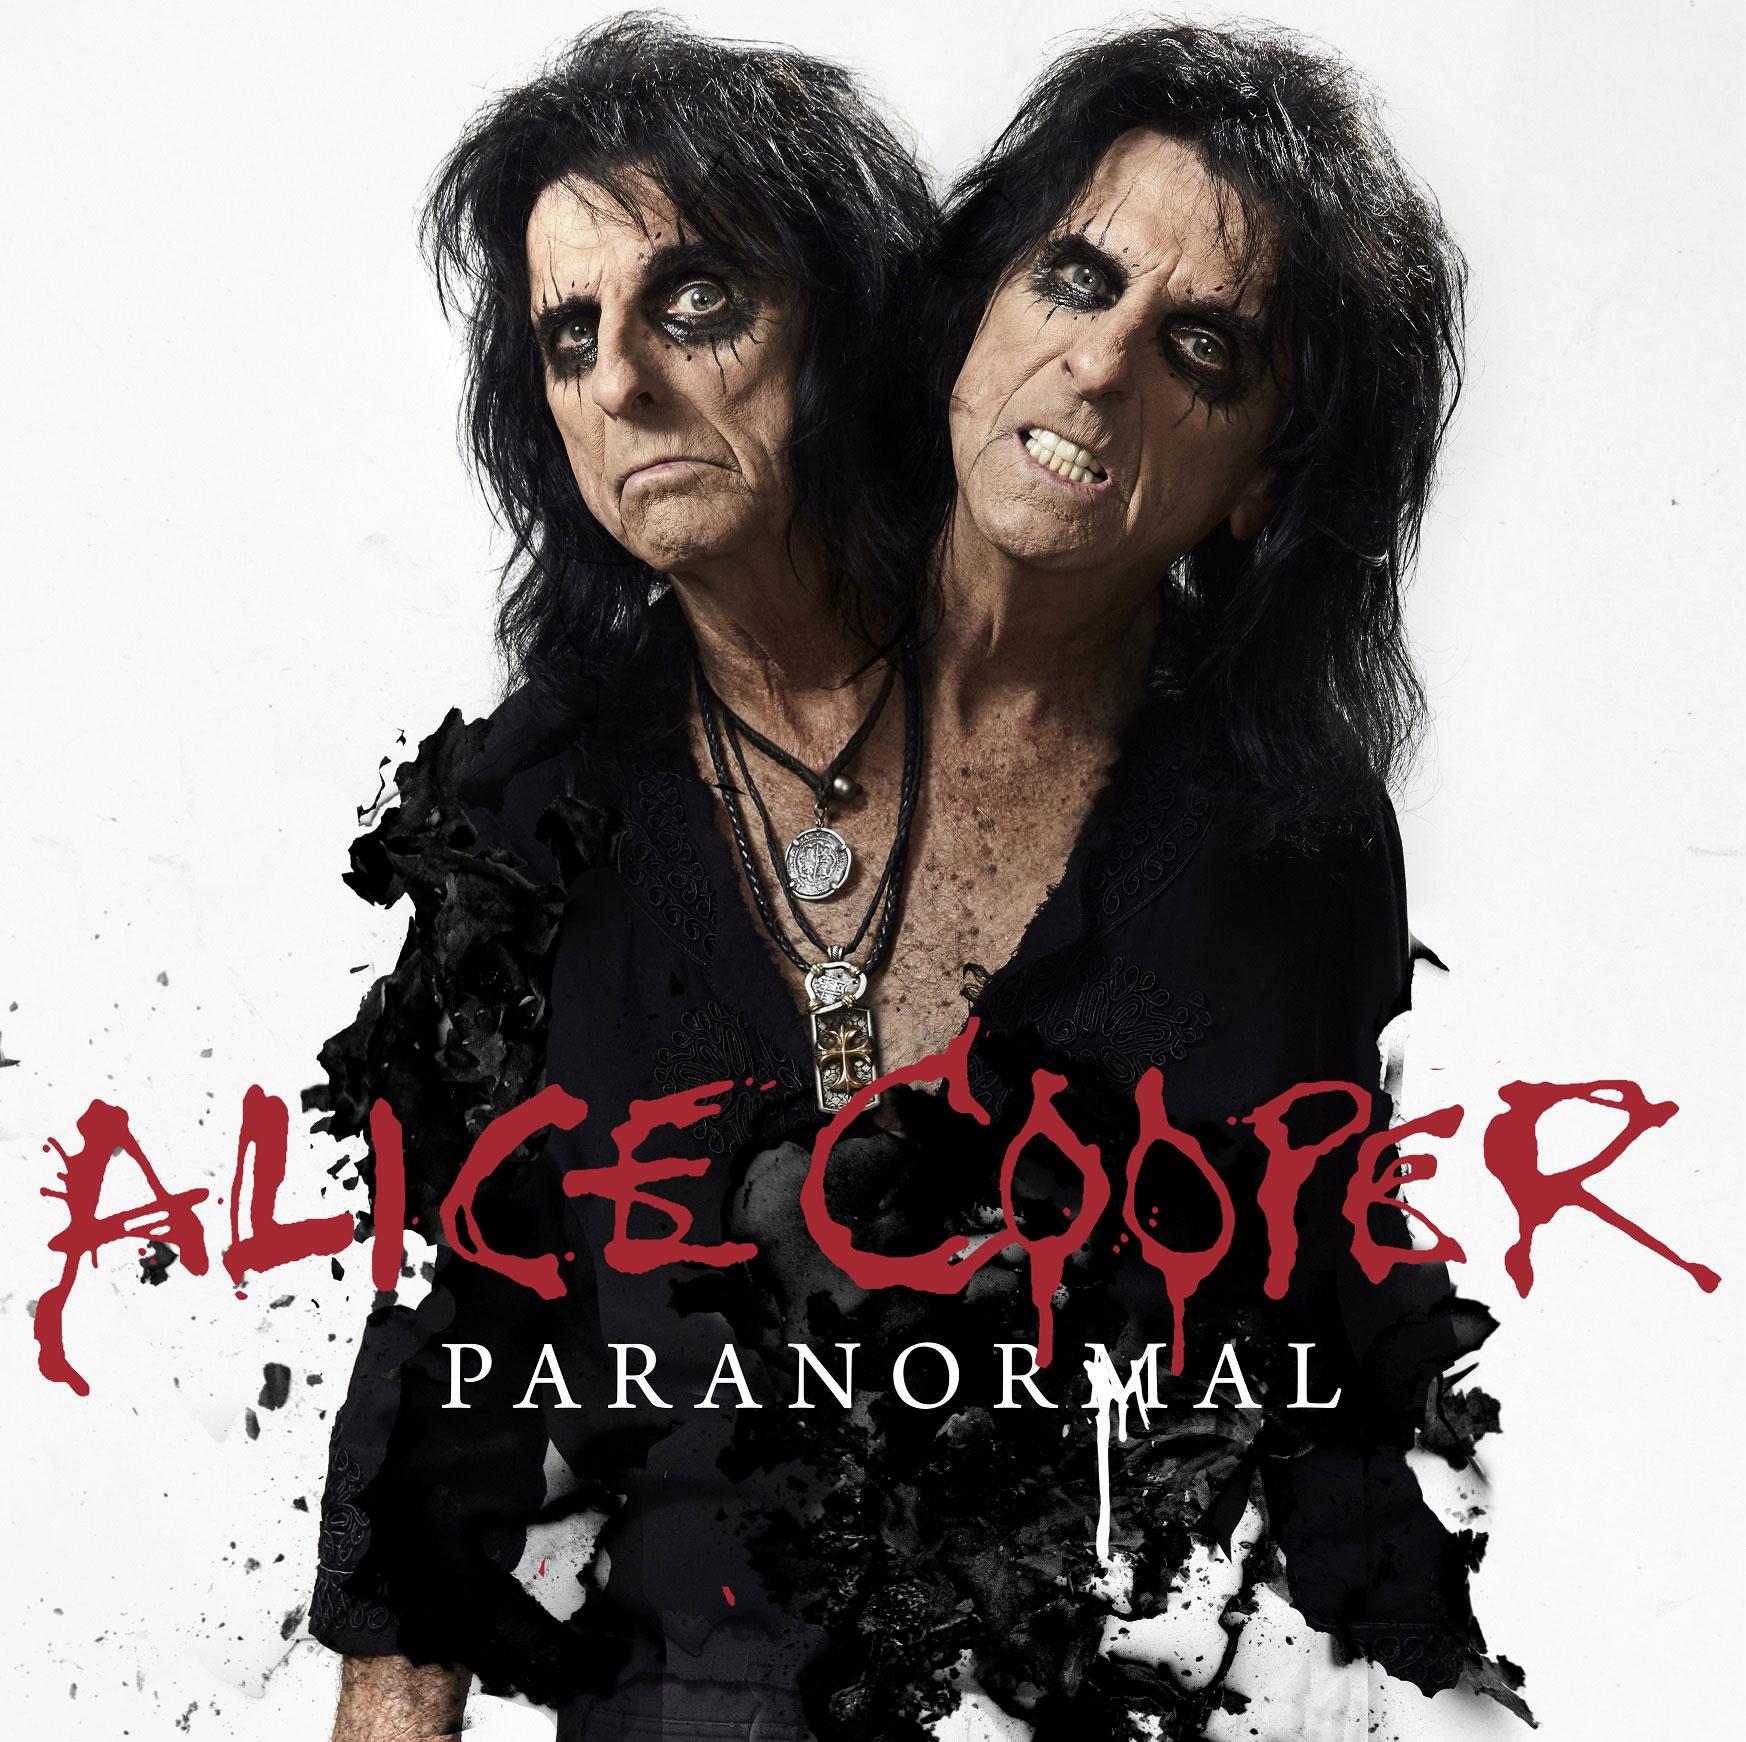 Элис Купер Alice Cooper. Paranormal (2 LP) элис купер alice cooper killer lp